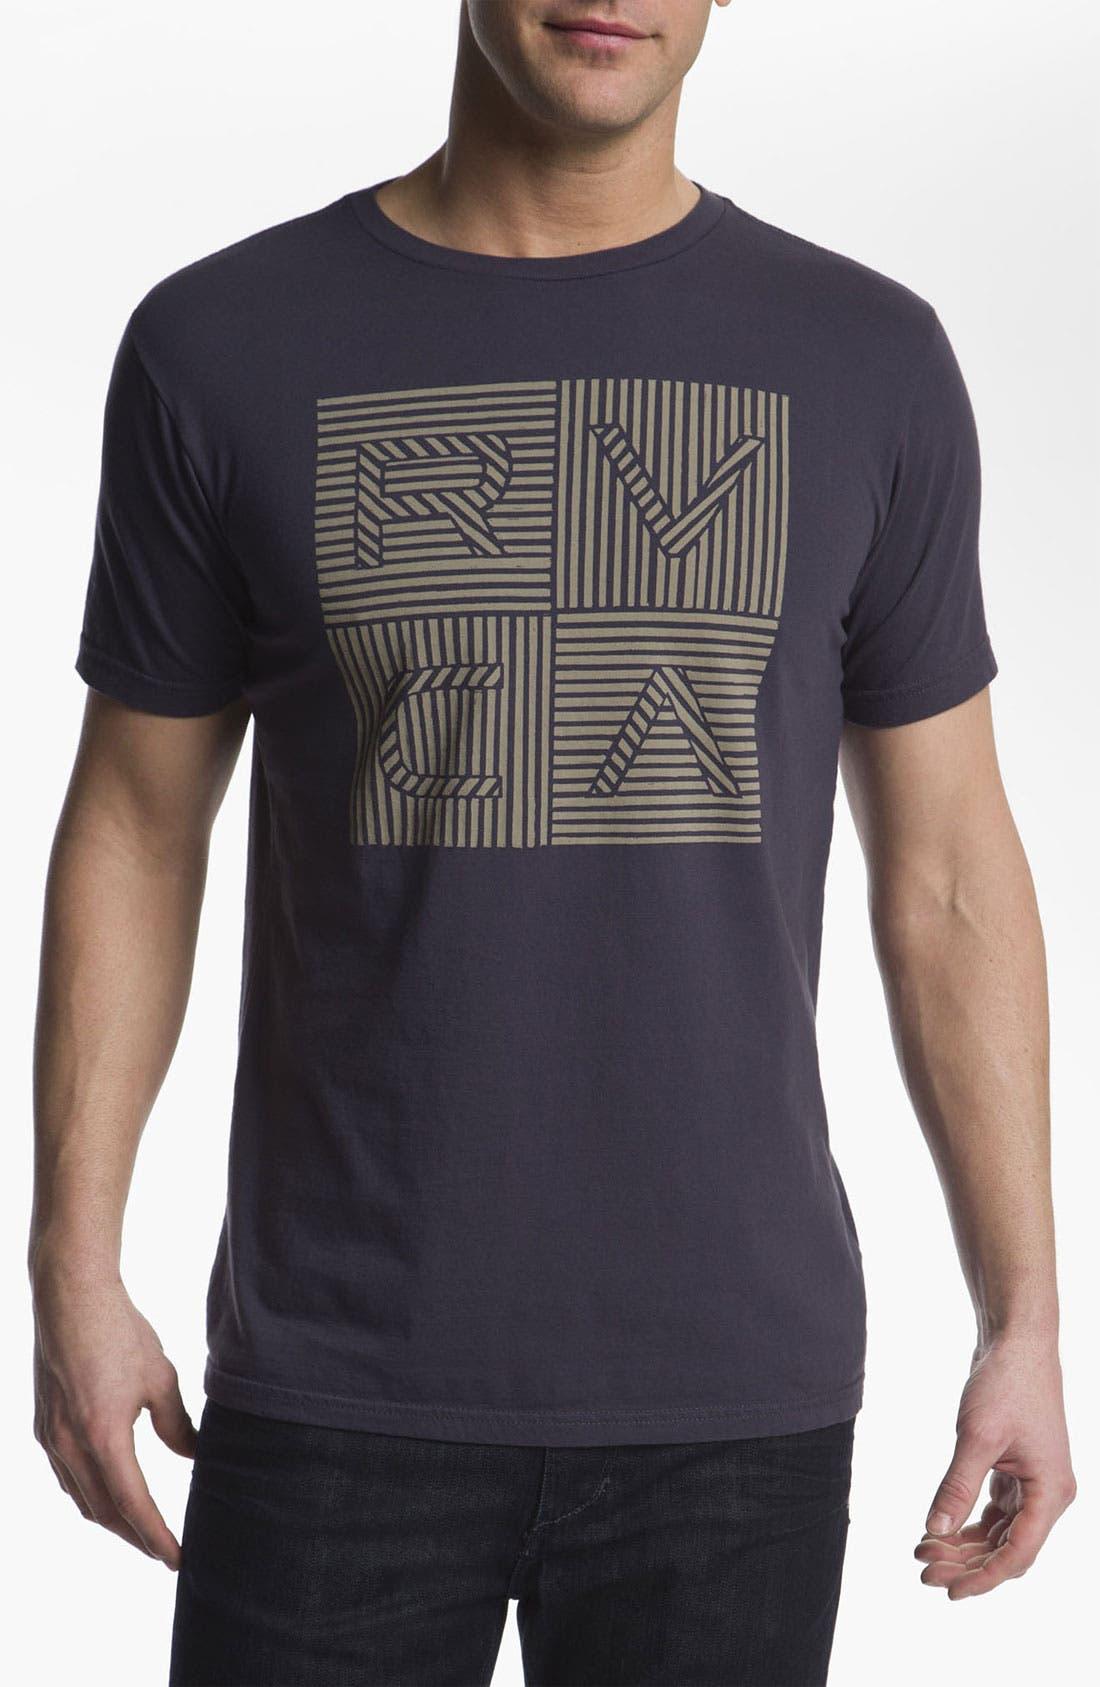 Main Image - RVCA 'Lines & Lines' T-Shirt